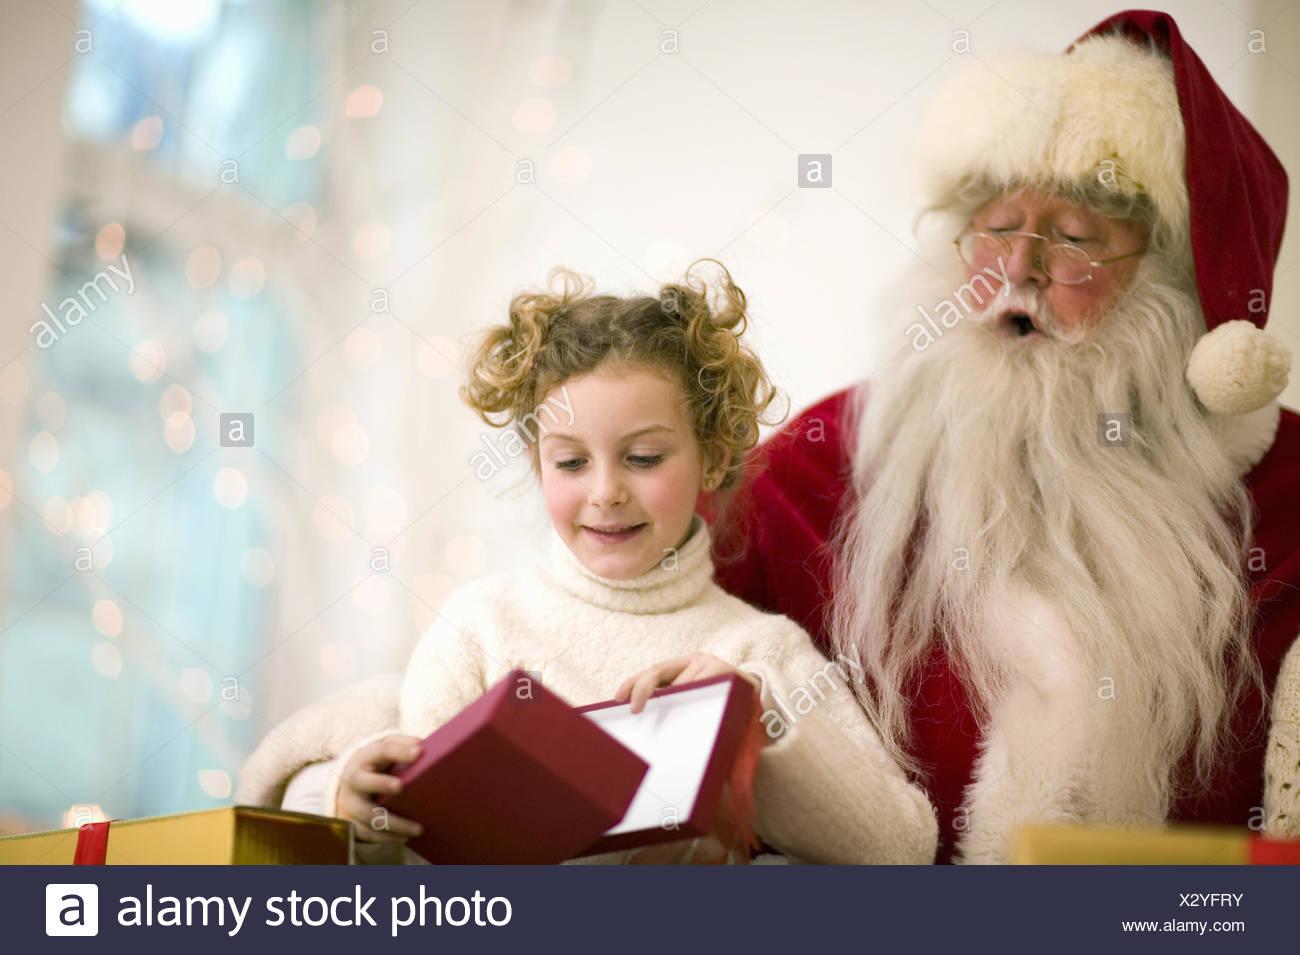 Santa Claus giving gift to young girl on Christmas - Stock Image